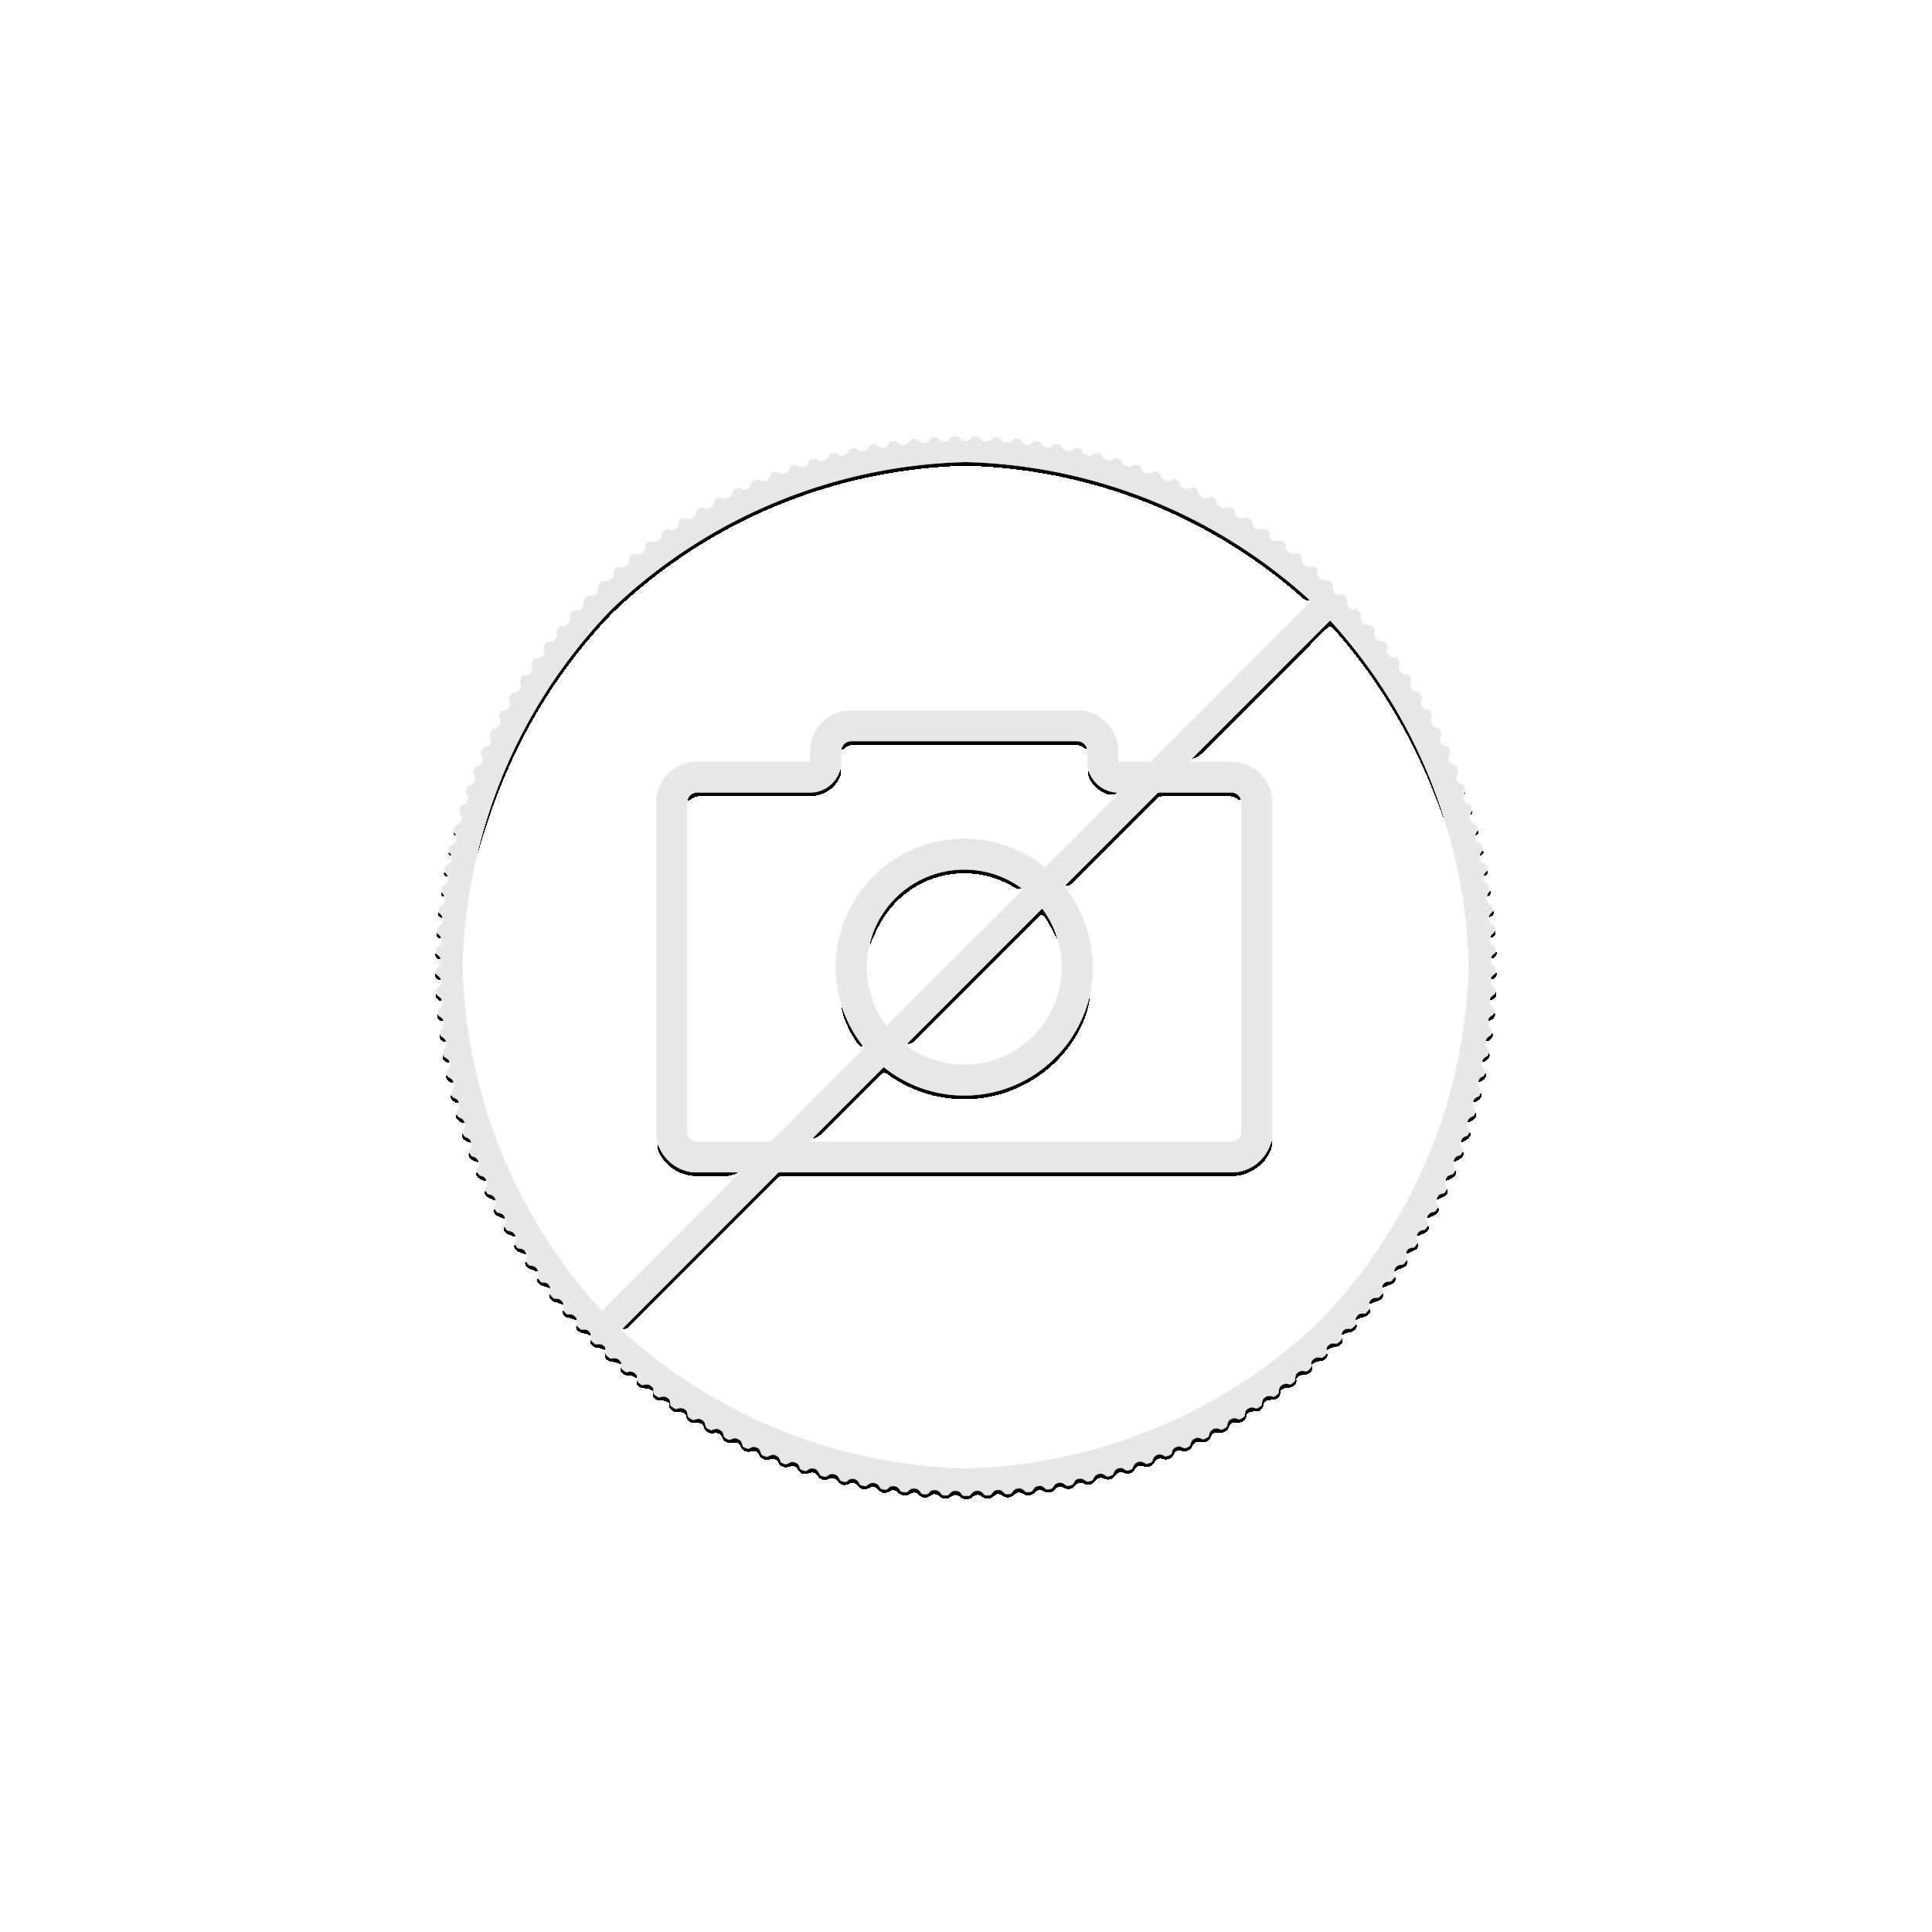 1 troy ounce gold Krugerrand coin 2019